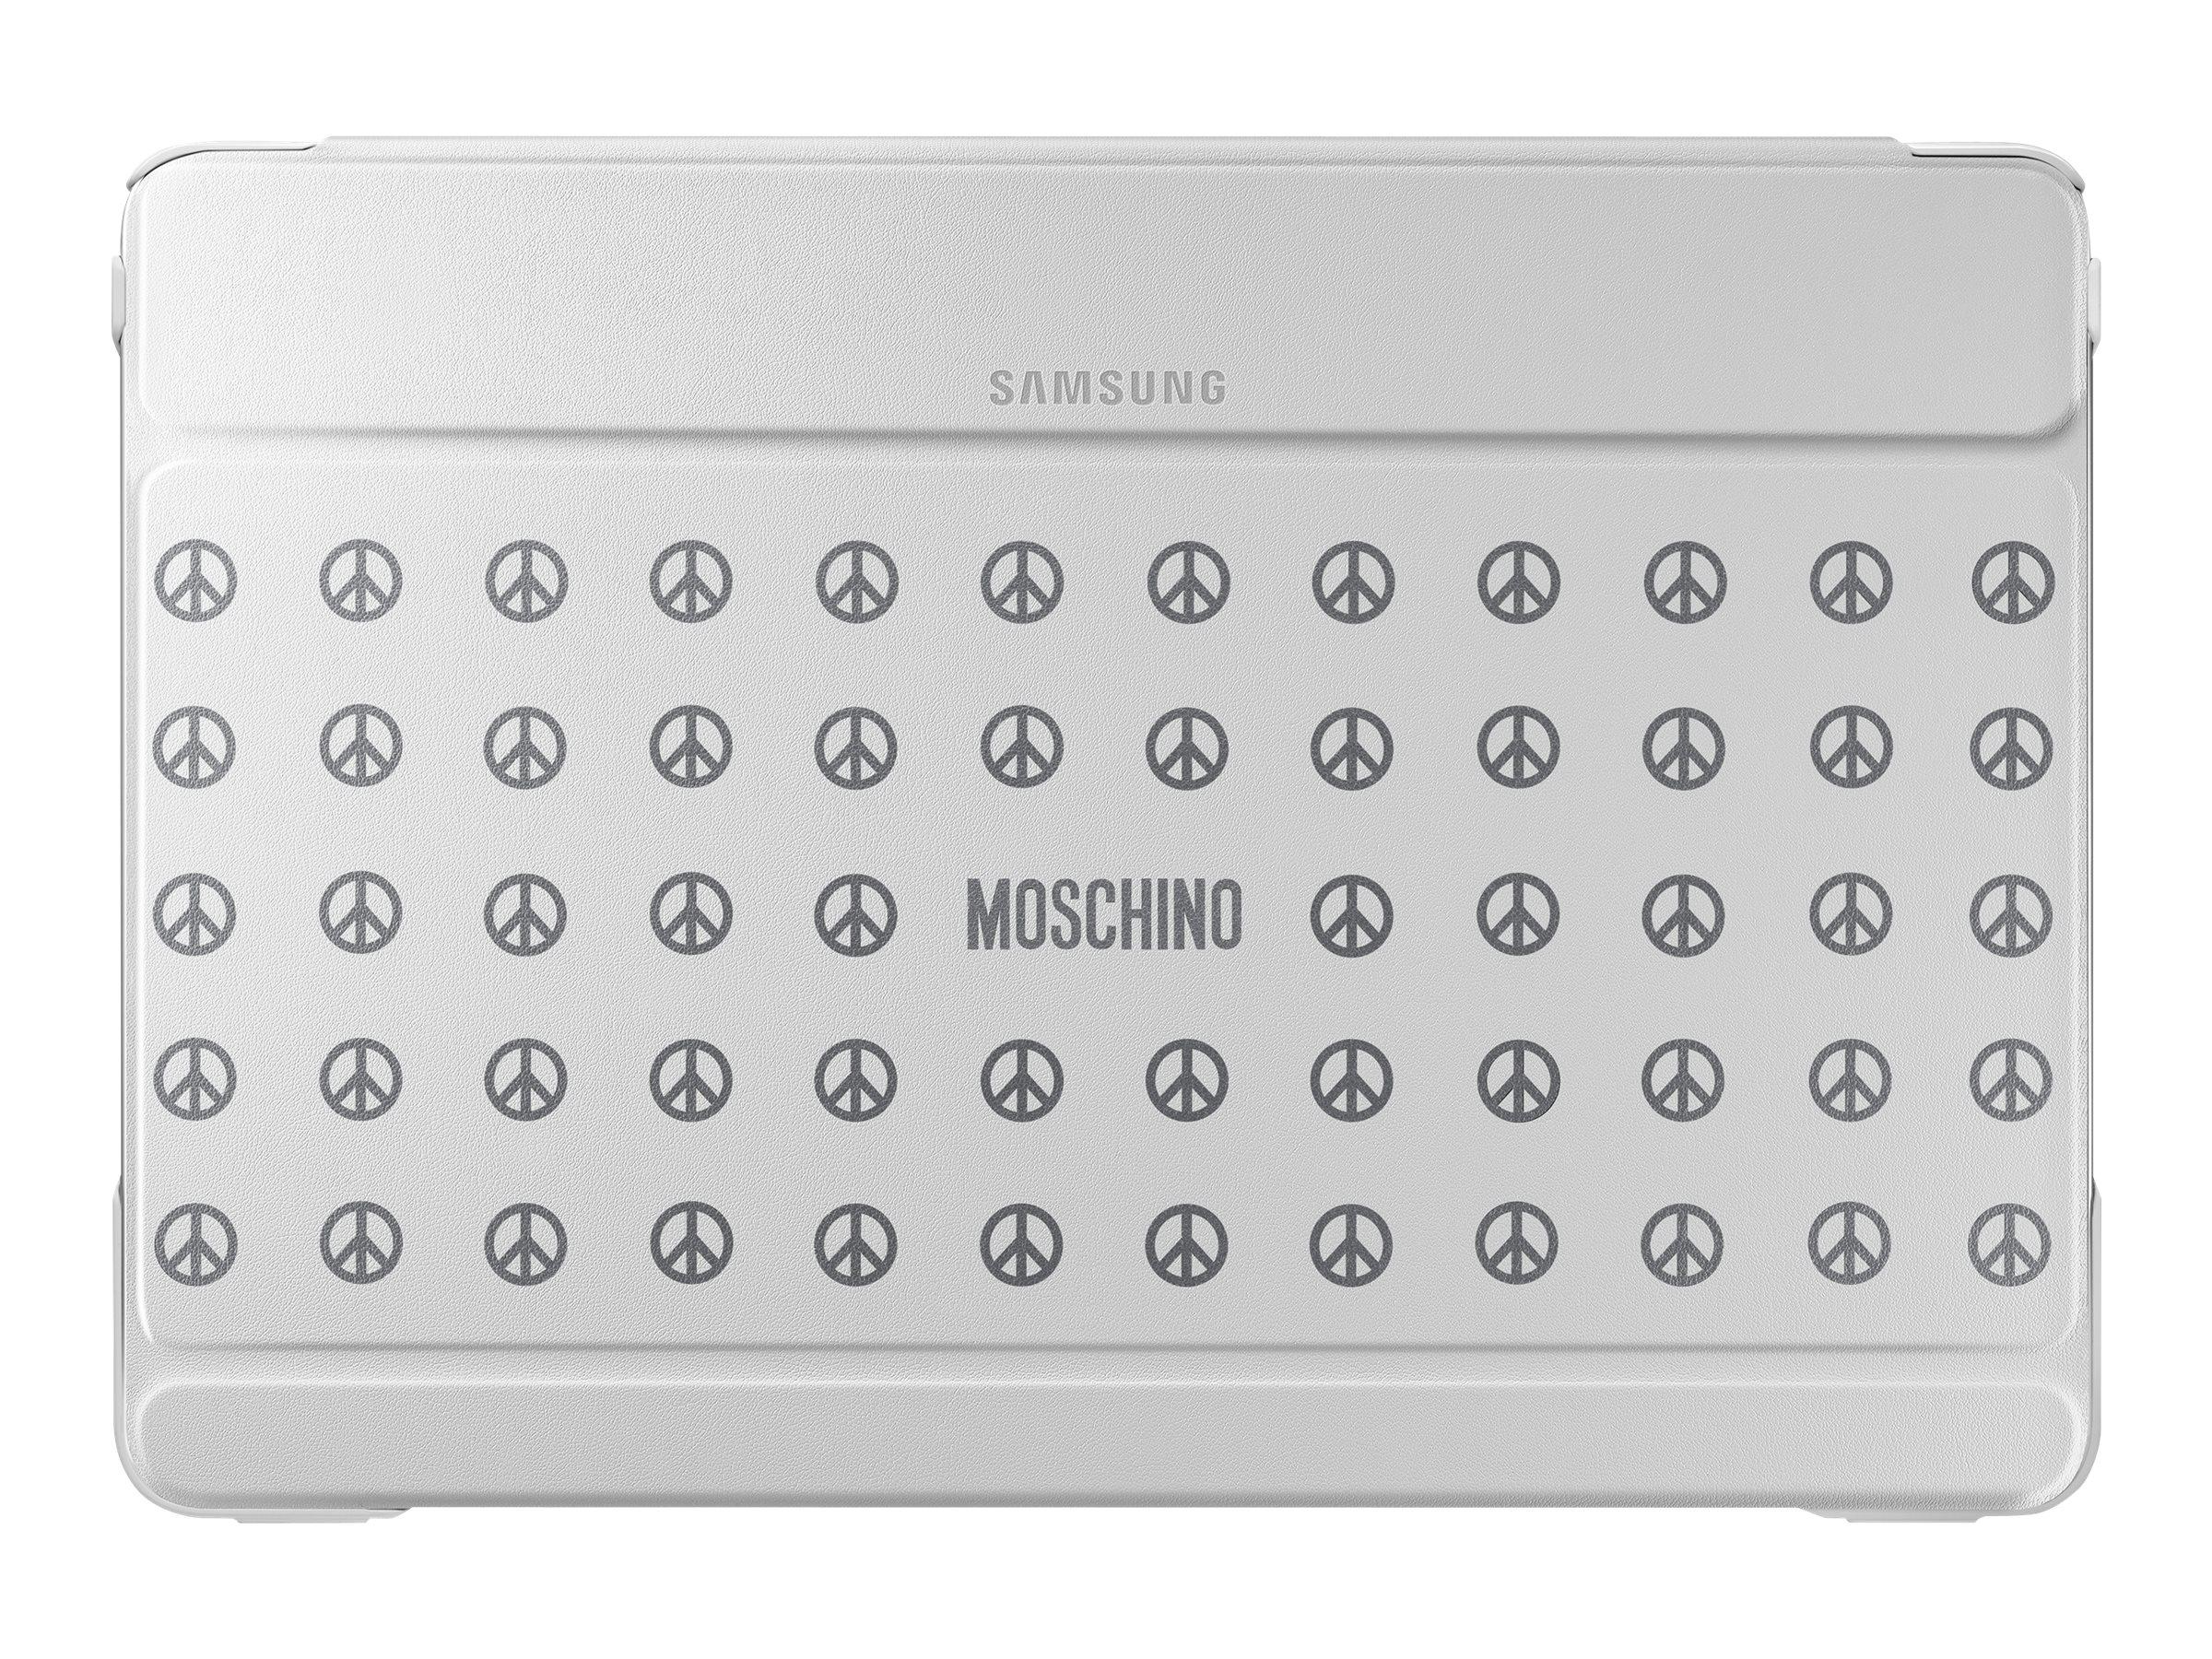 Samsung Book Cover EF-EP900B - Moschino Edition vippedeksel for nettbrett EF-EP900BZEGWW